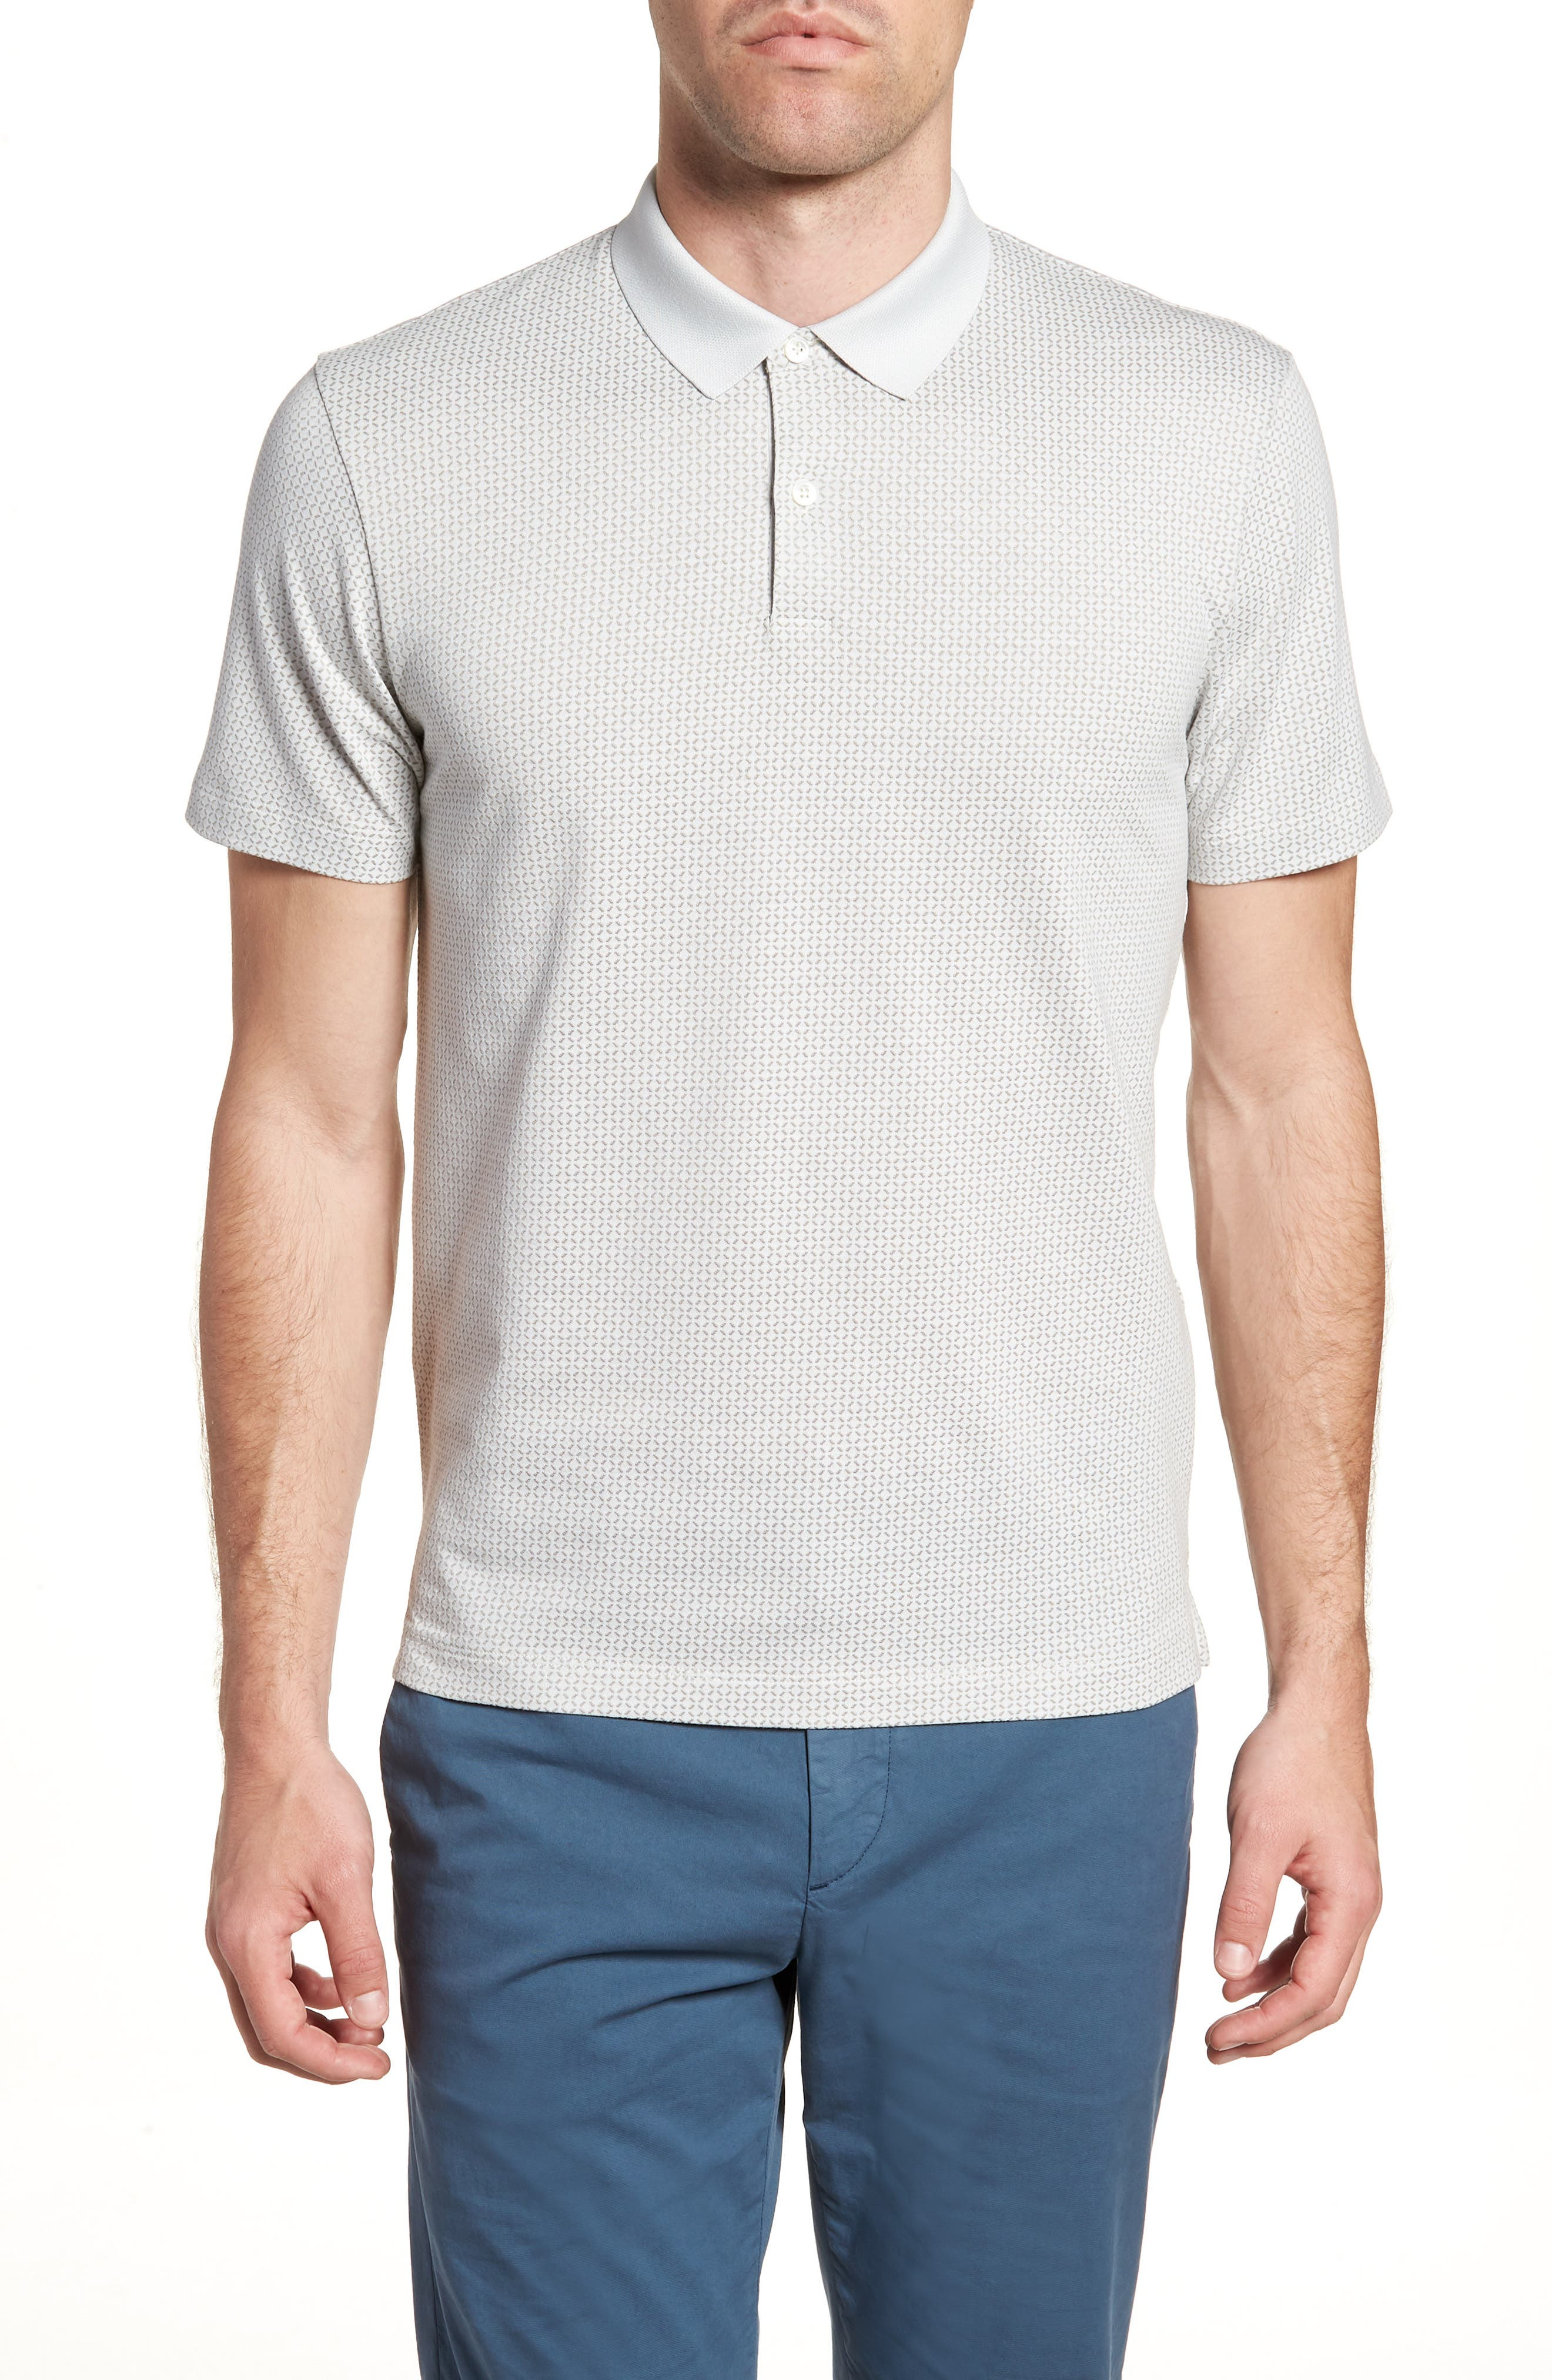 Sillar Slim Fit Polo,                         Main,                         color, 096